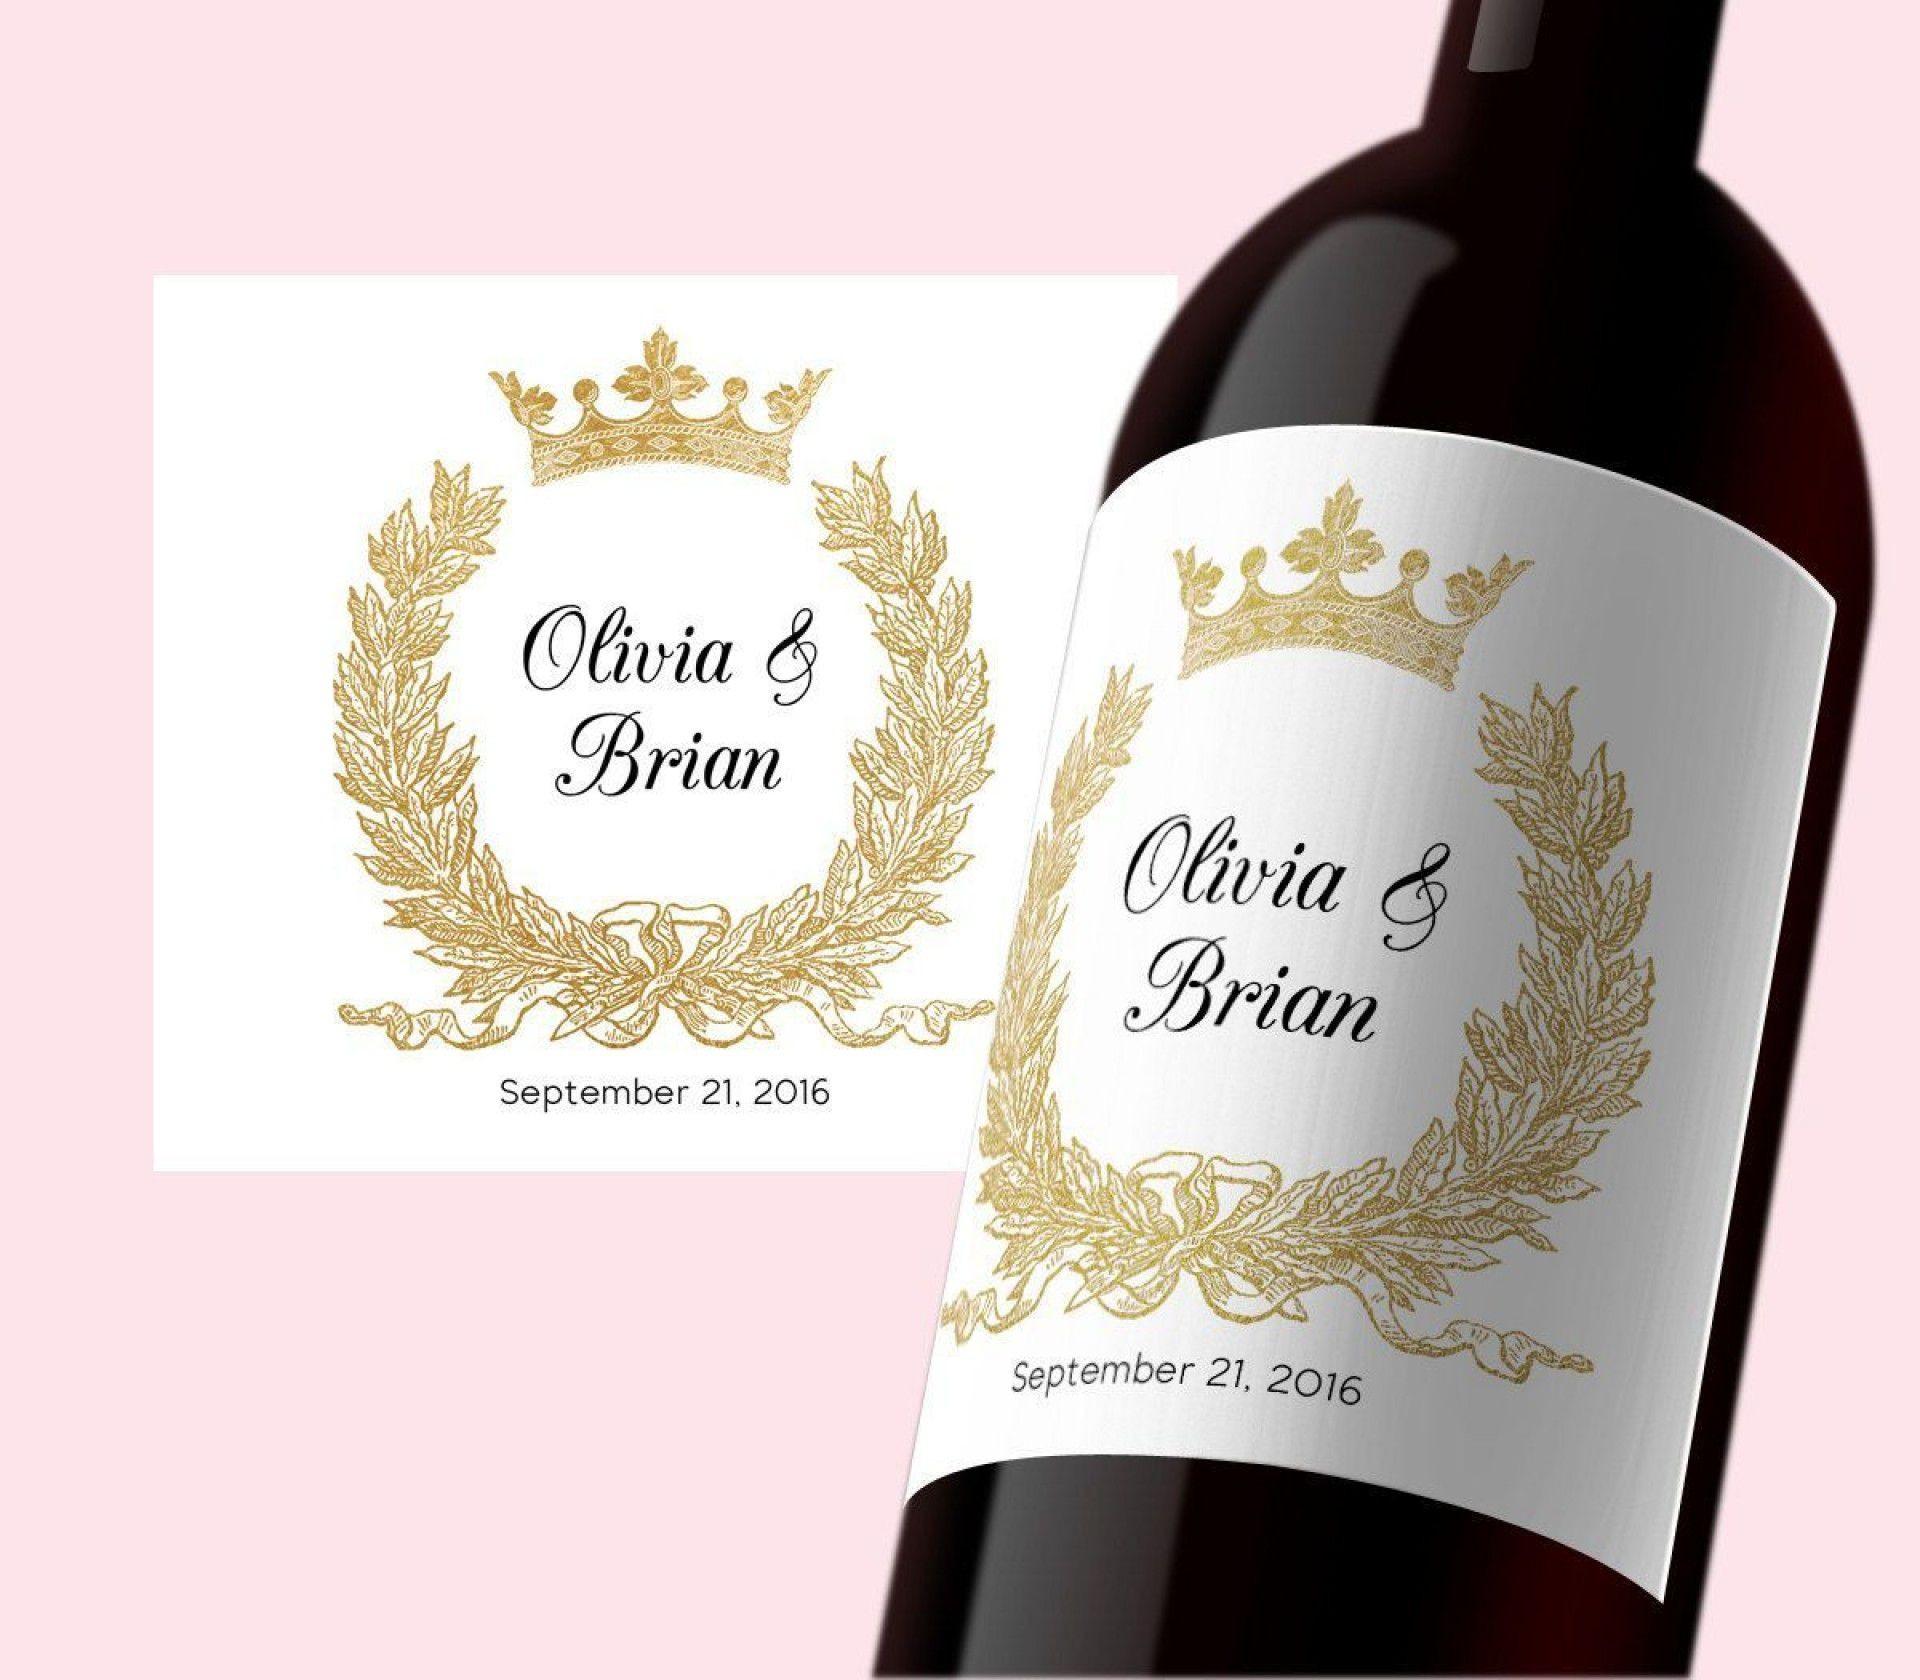 000 Phenomenal Free Wine Bottle Label Template Idea  Mini Printable1920